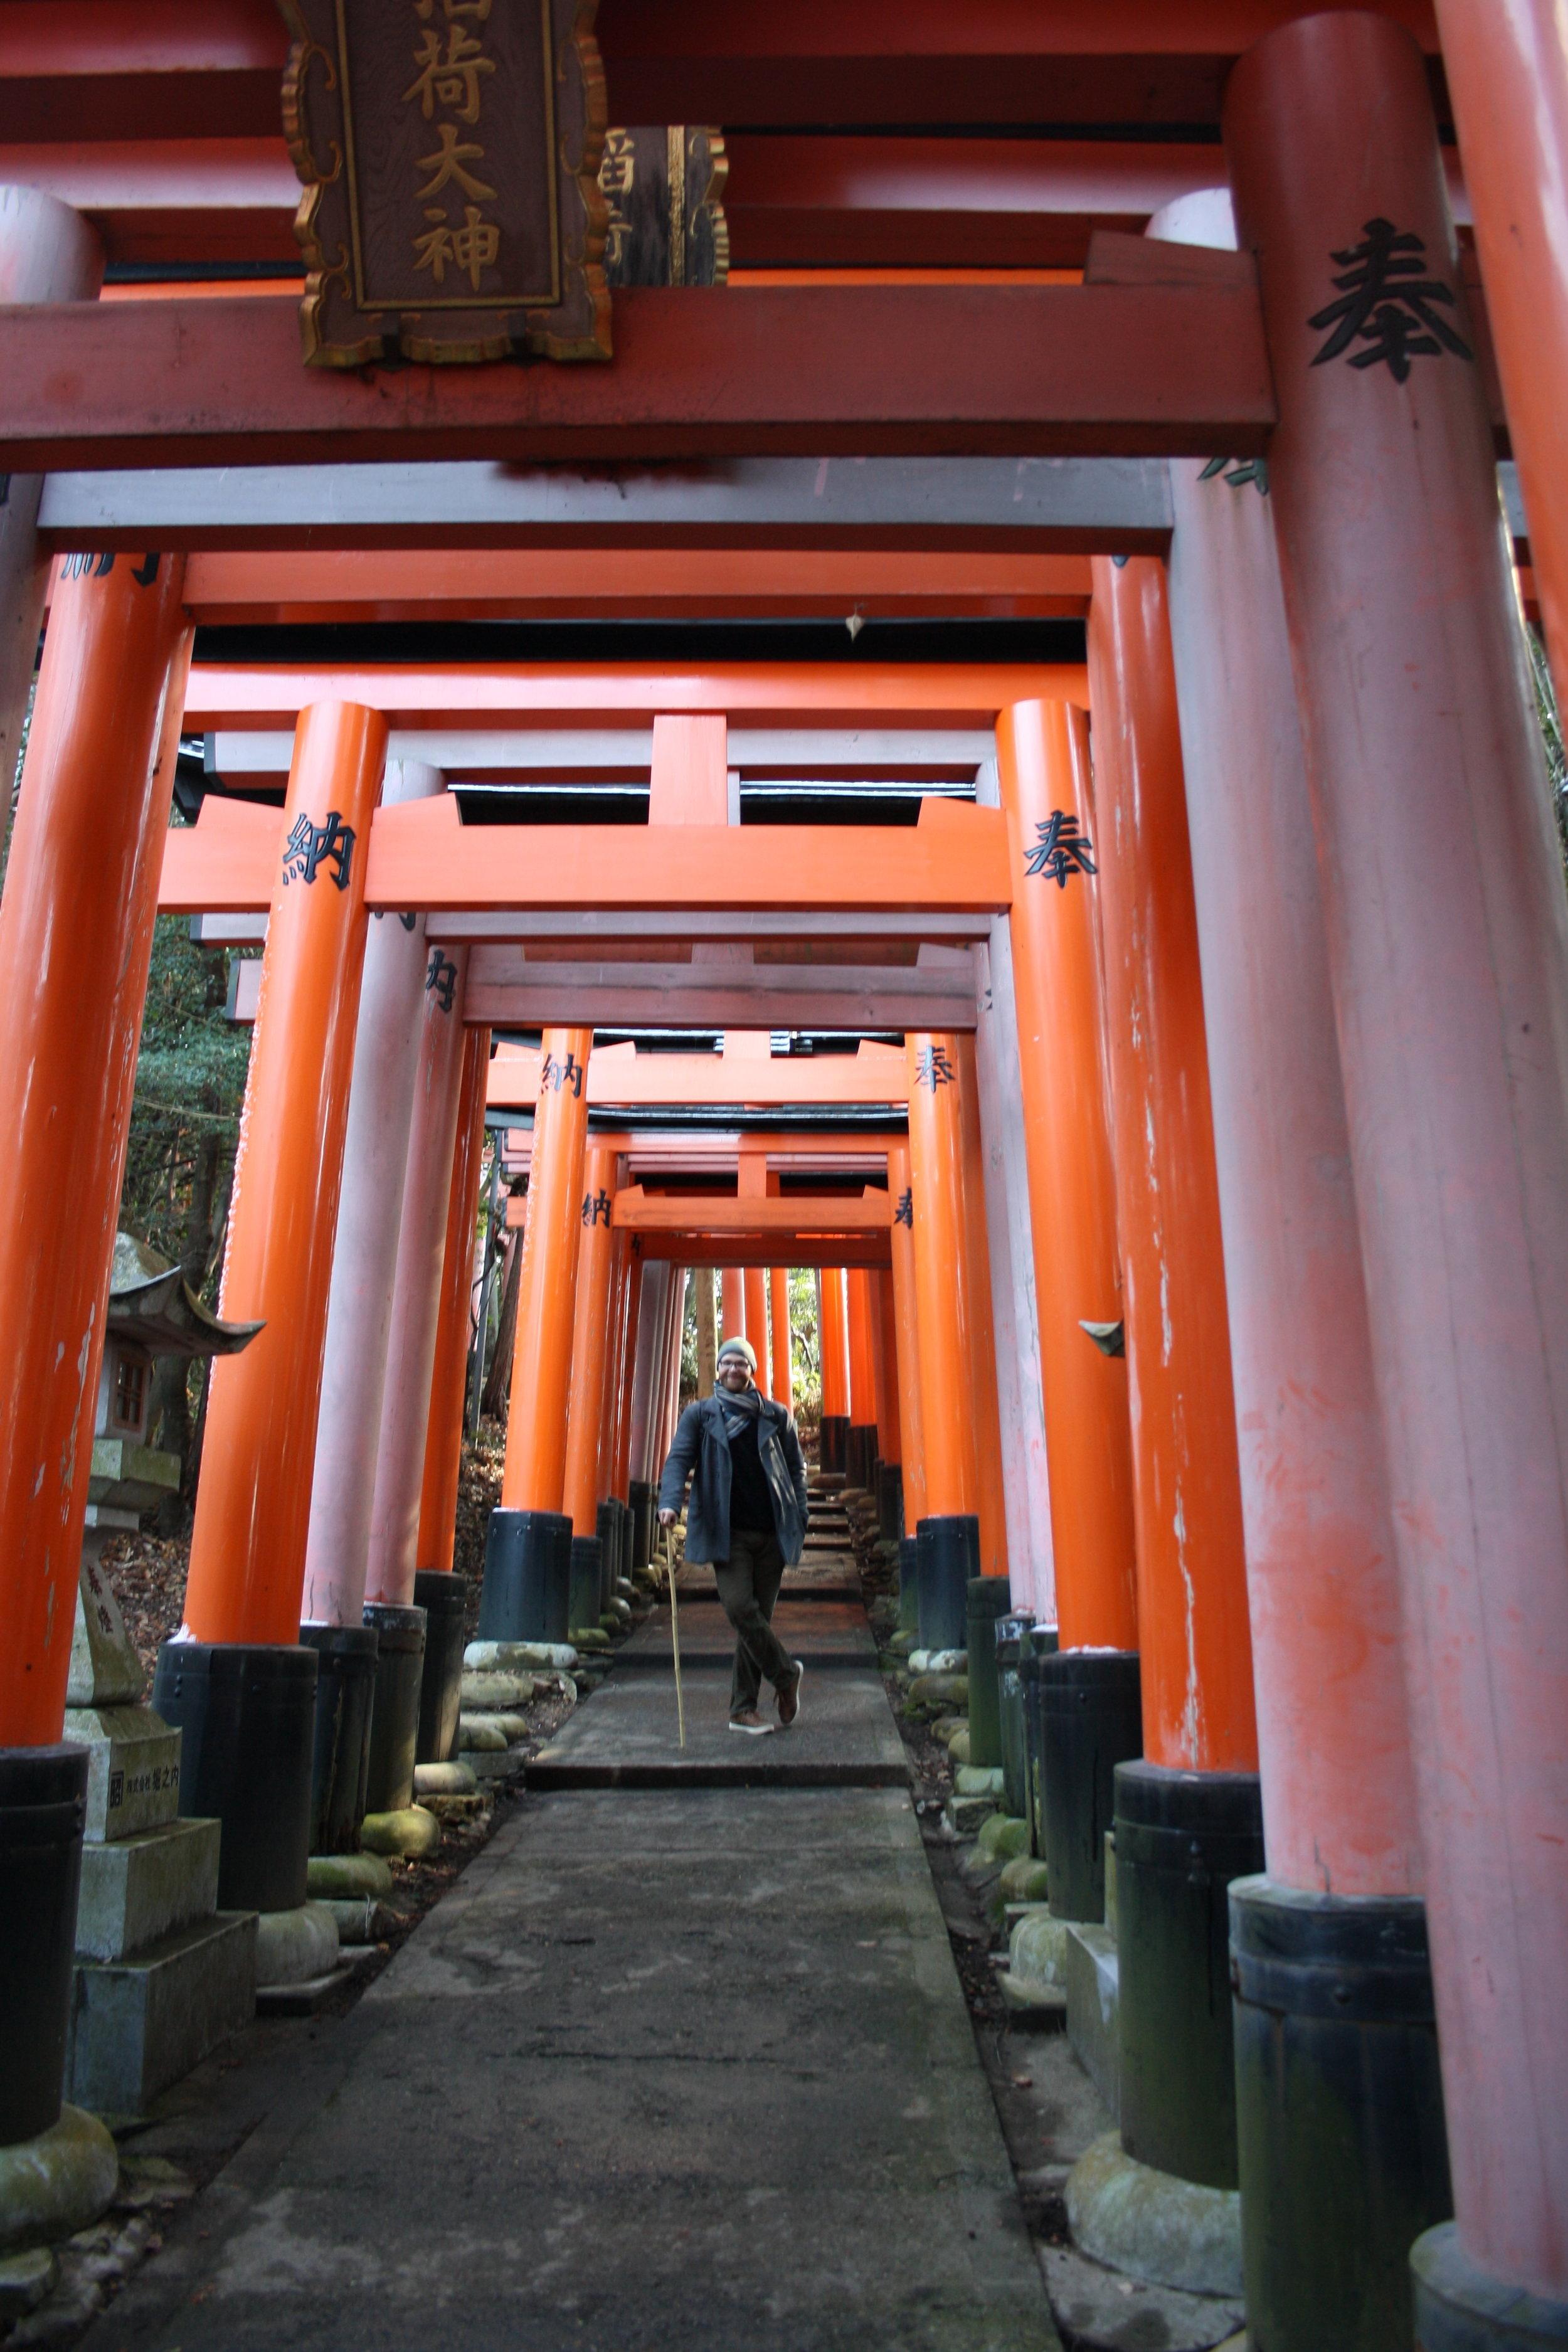 Fushimi Inari - A fascinating place